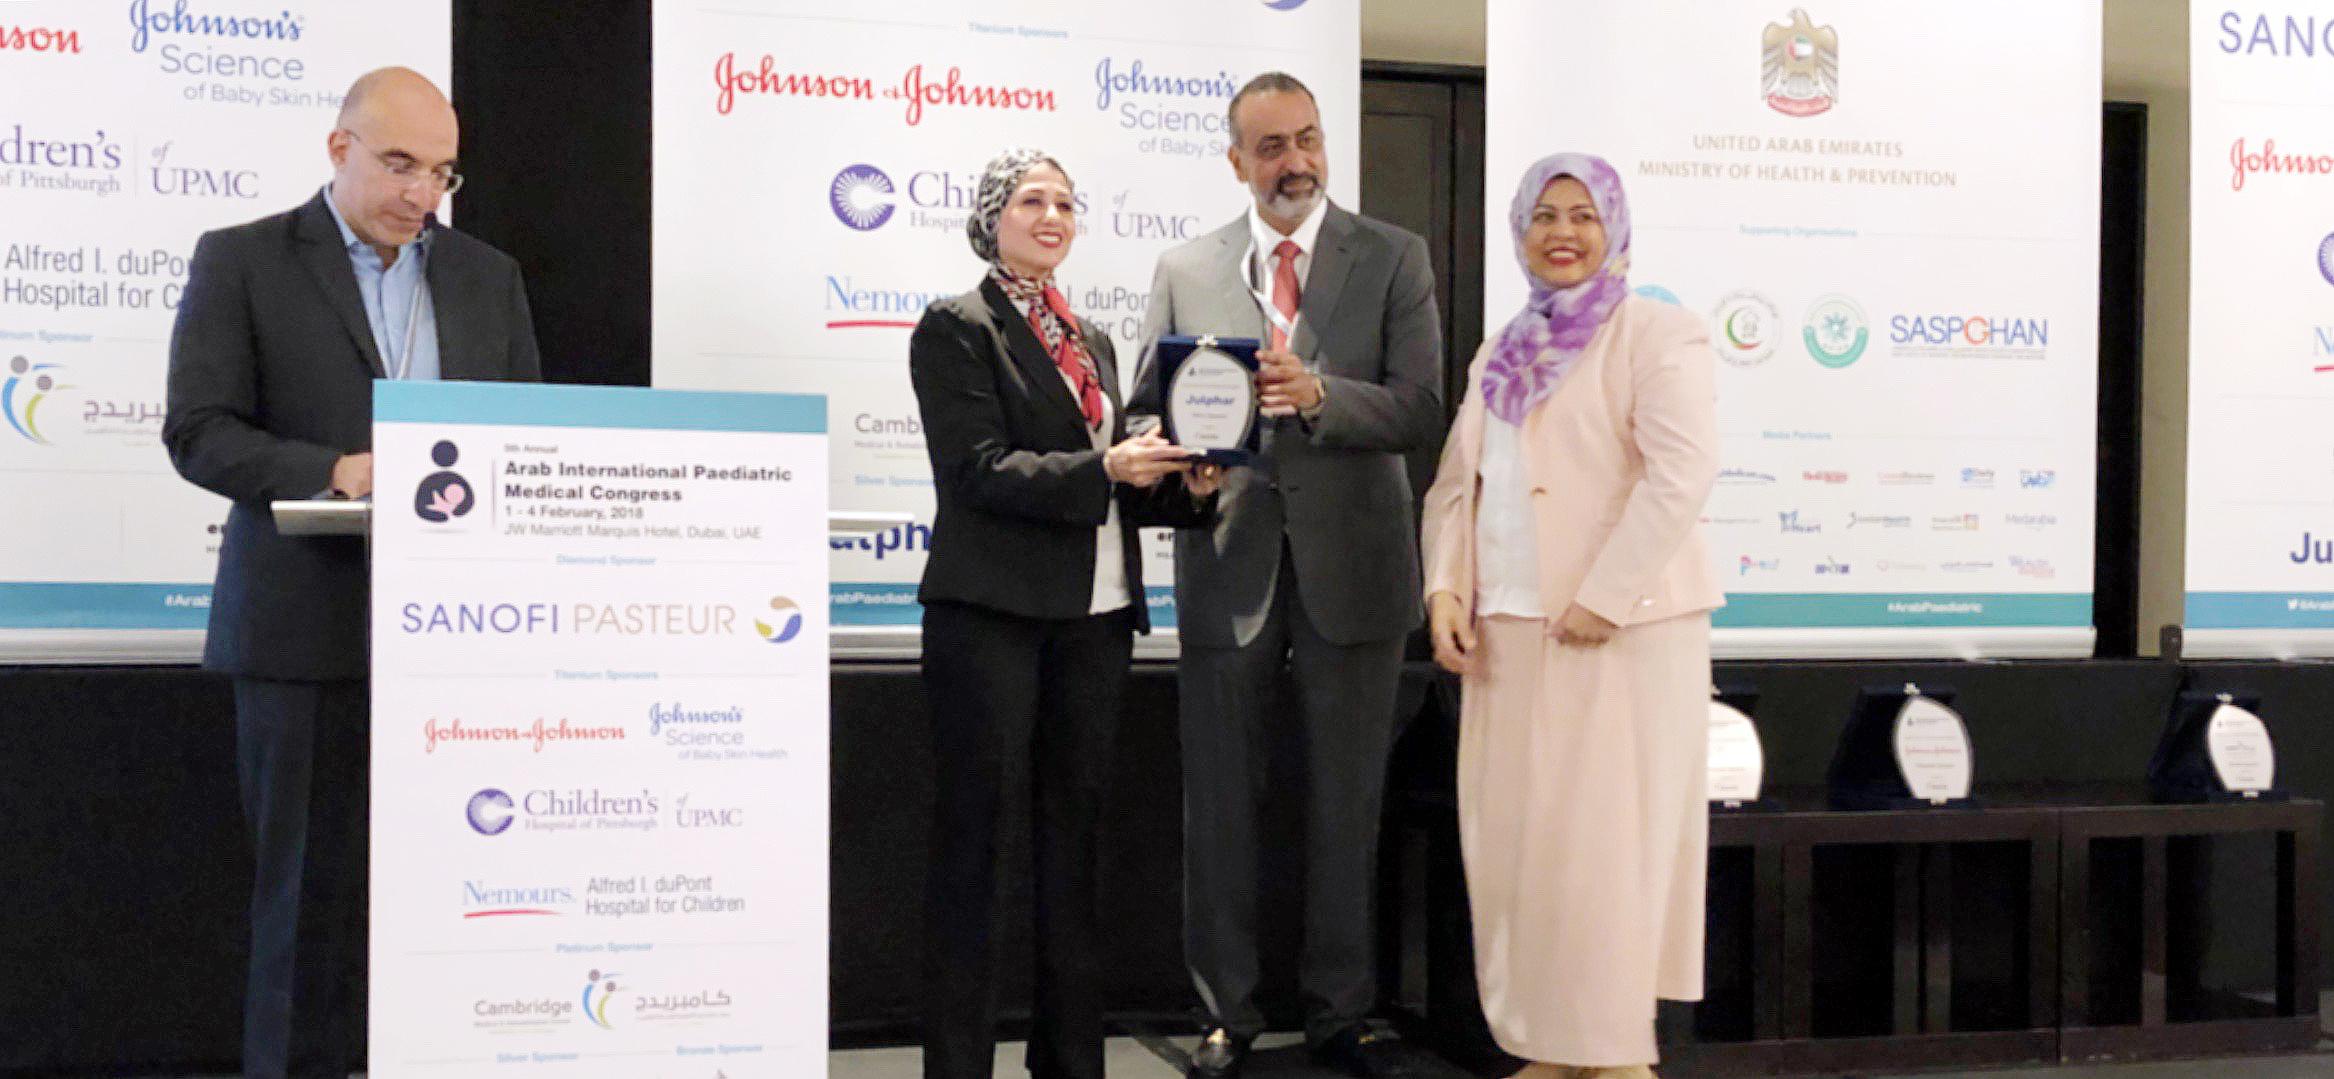 Julphar participates in the Arab Pediatric Medical Congress